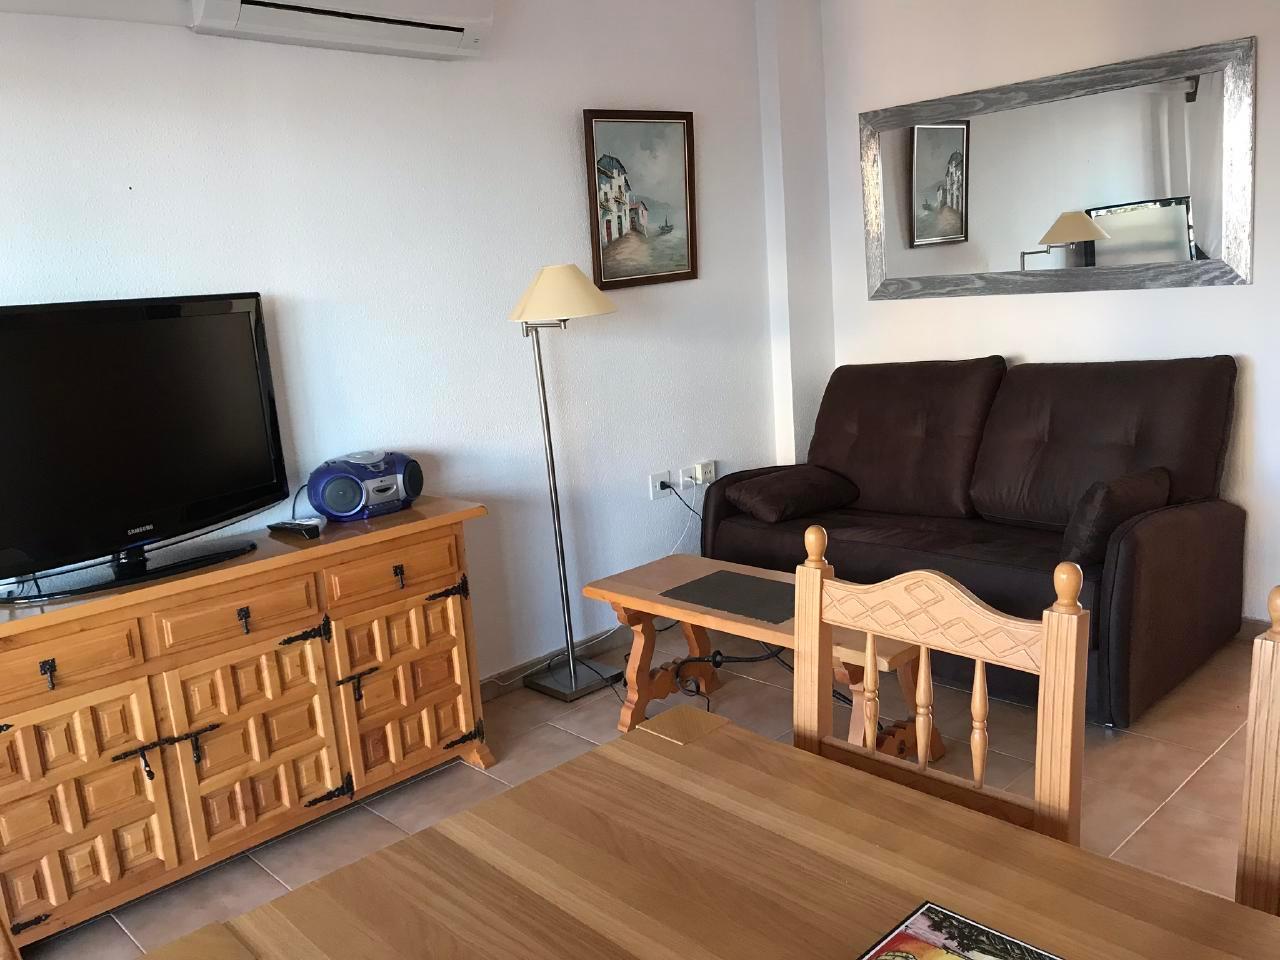 Appartement de vacances Sonnige 3.5 Zi-Wohnung am Meer (1026876), Torrevieja, Costa Blanca, Valence, Espagne, image 8